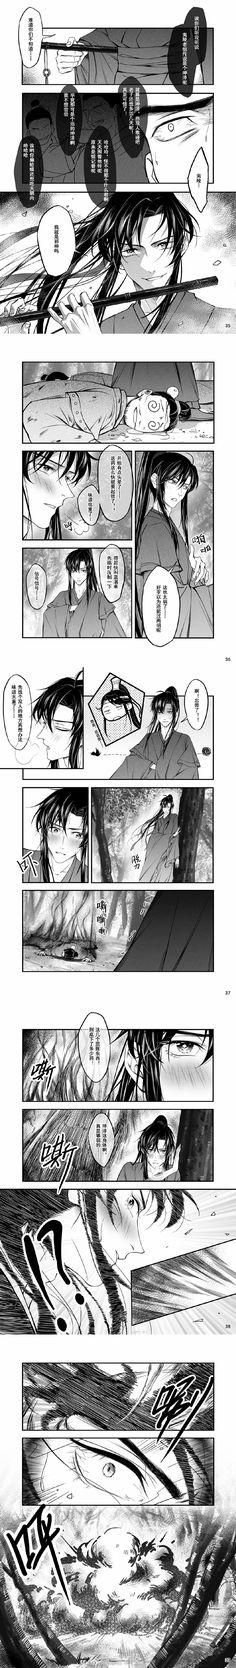 Manga Love, Anime Love, Anime Fanfiction, Shounen Ai Anime, Chibi Sketch, Chinese Cartoon, The Grandmaster, Miyazaki, Anime Chibi